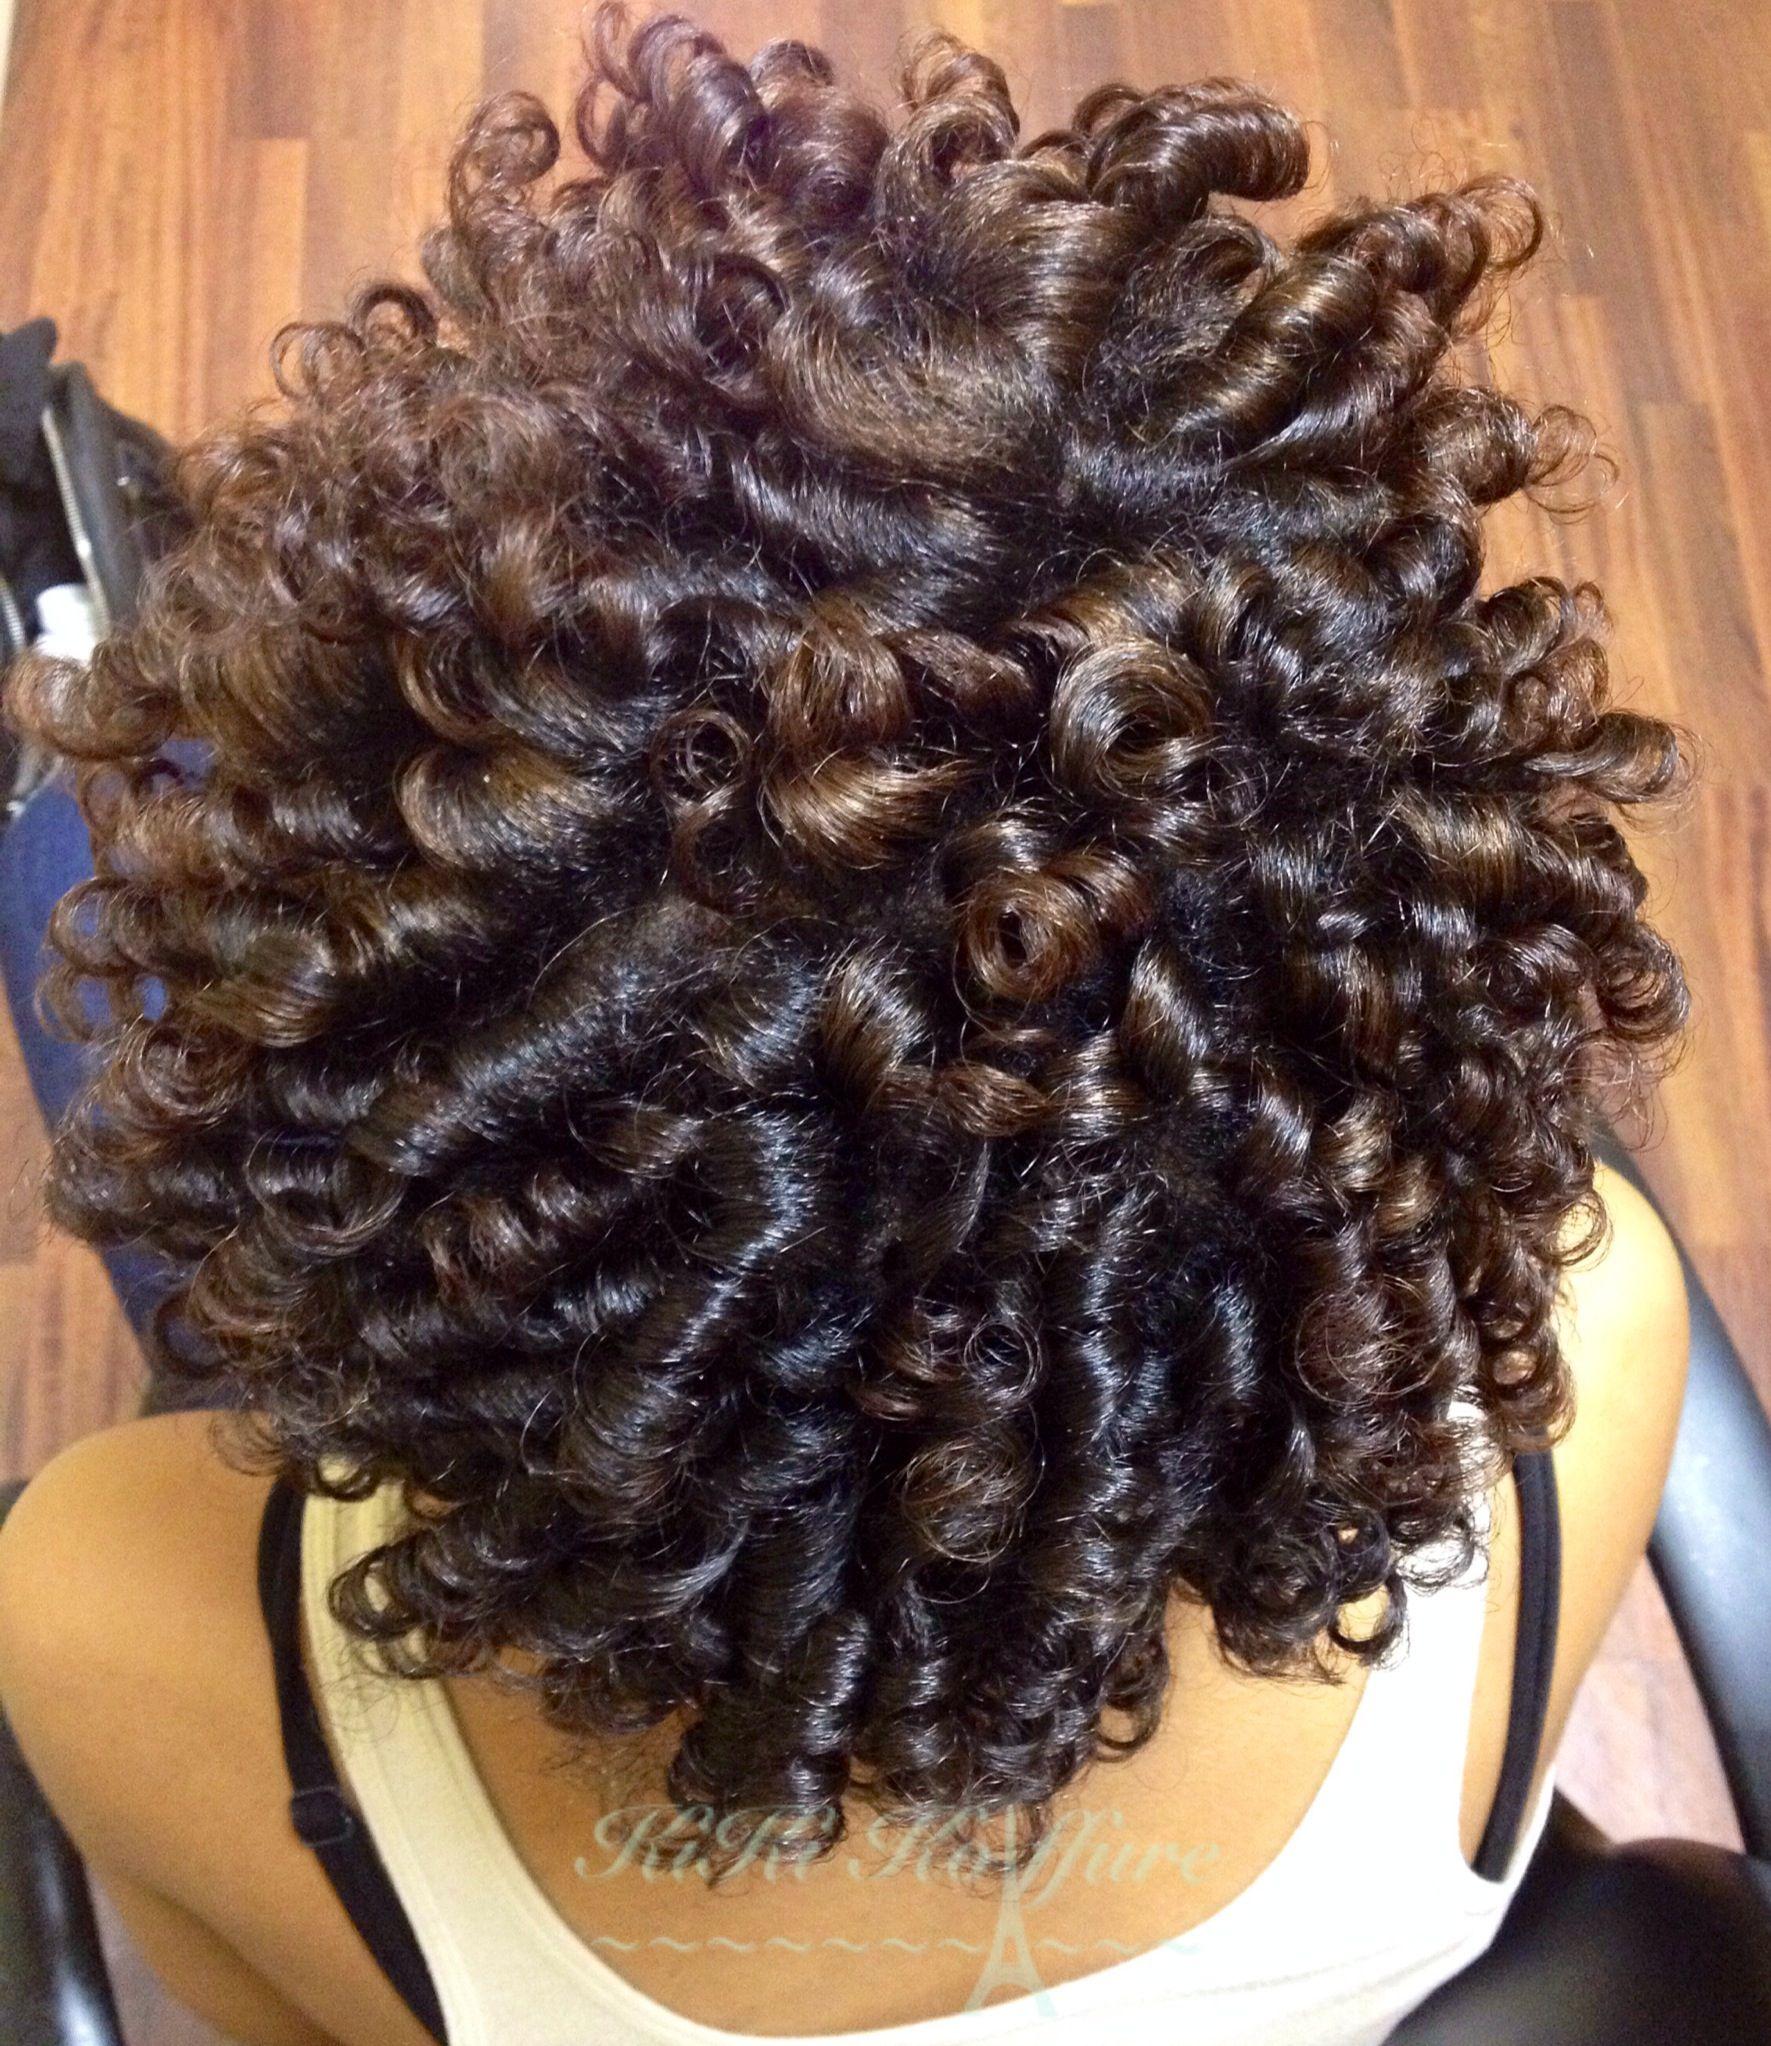 Perm rod curls!